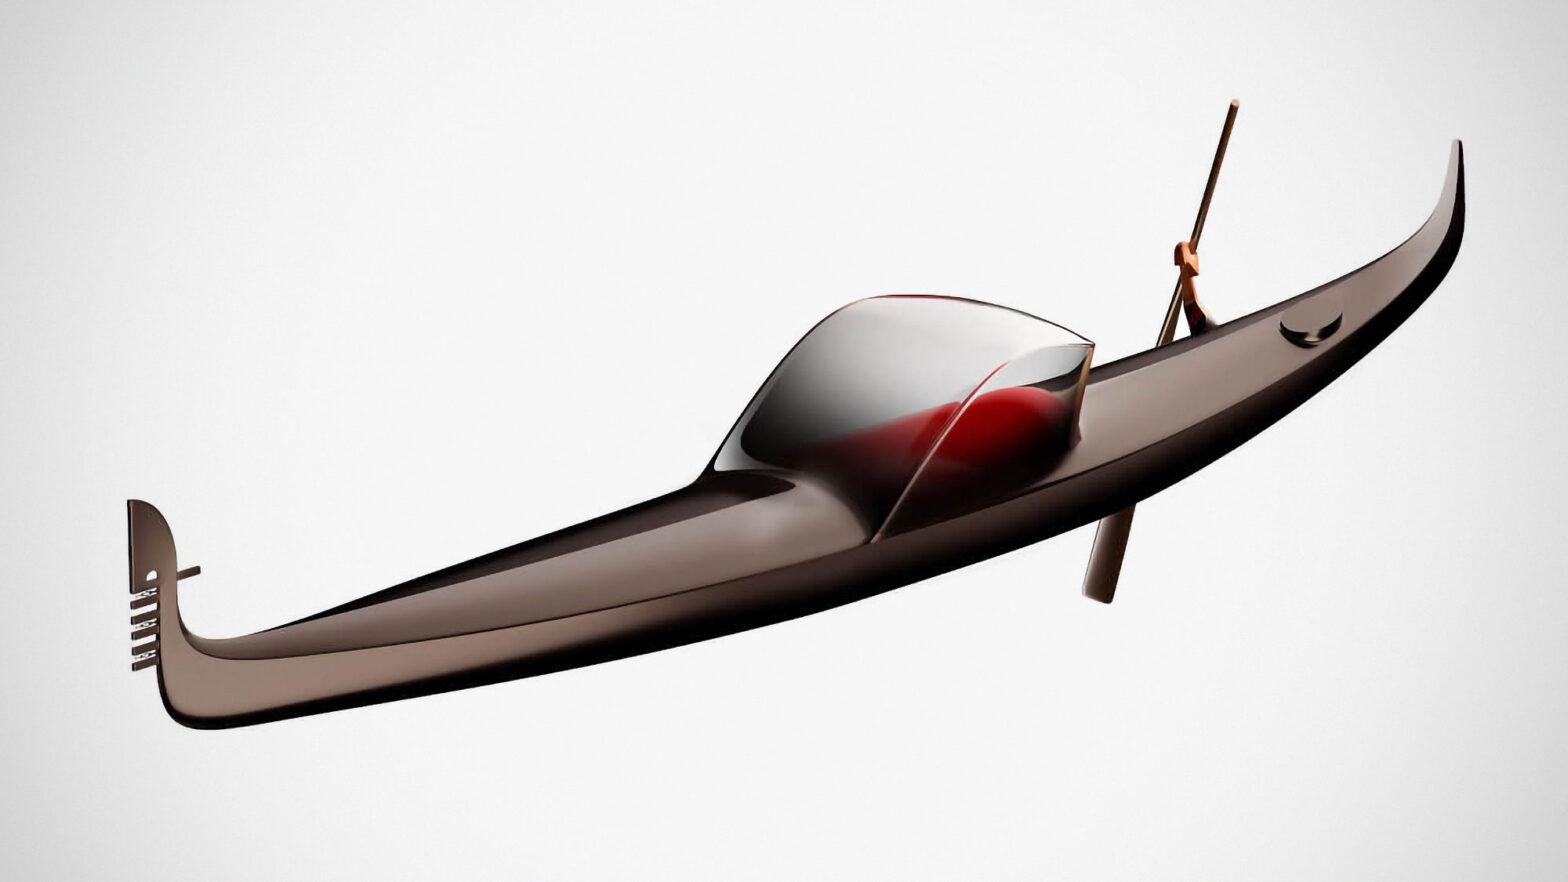 Dream of Winter Gondola for Venice by Philippe Starck